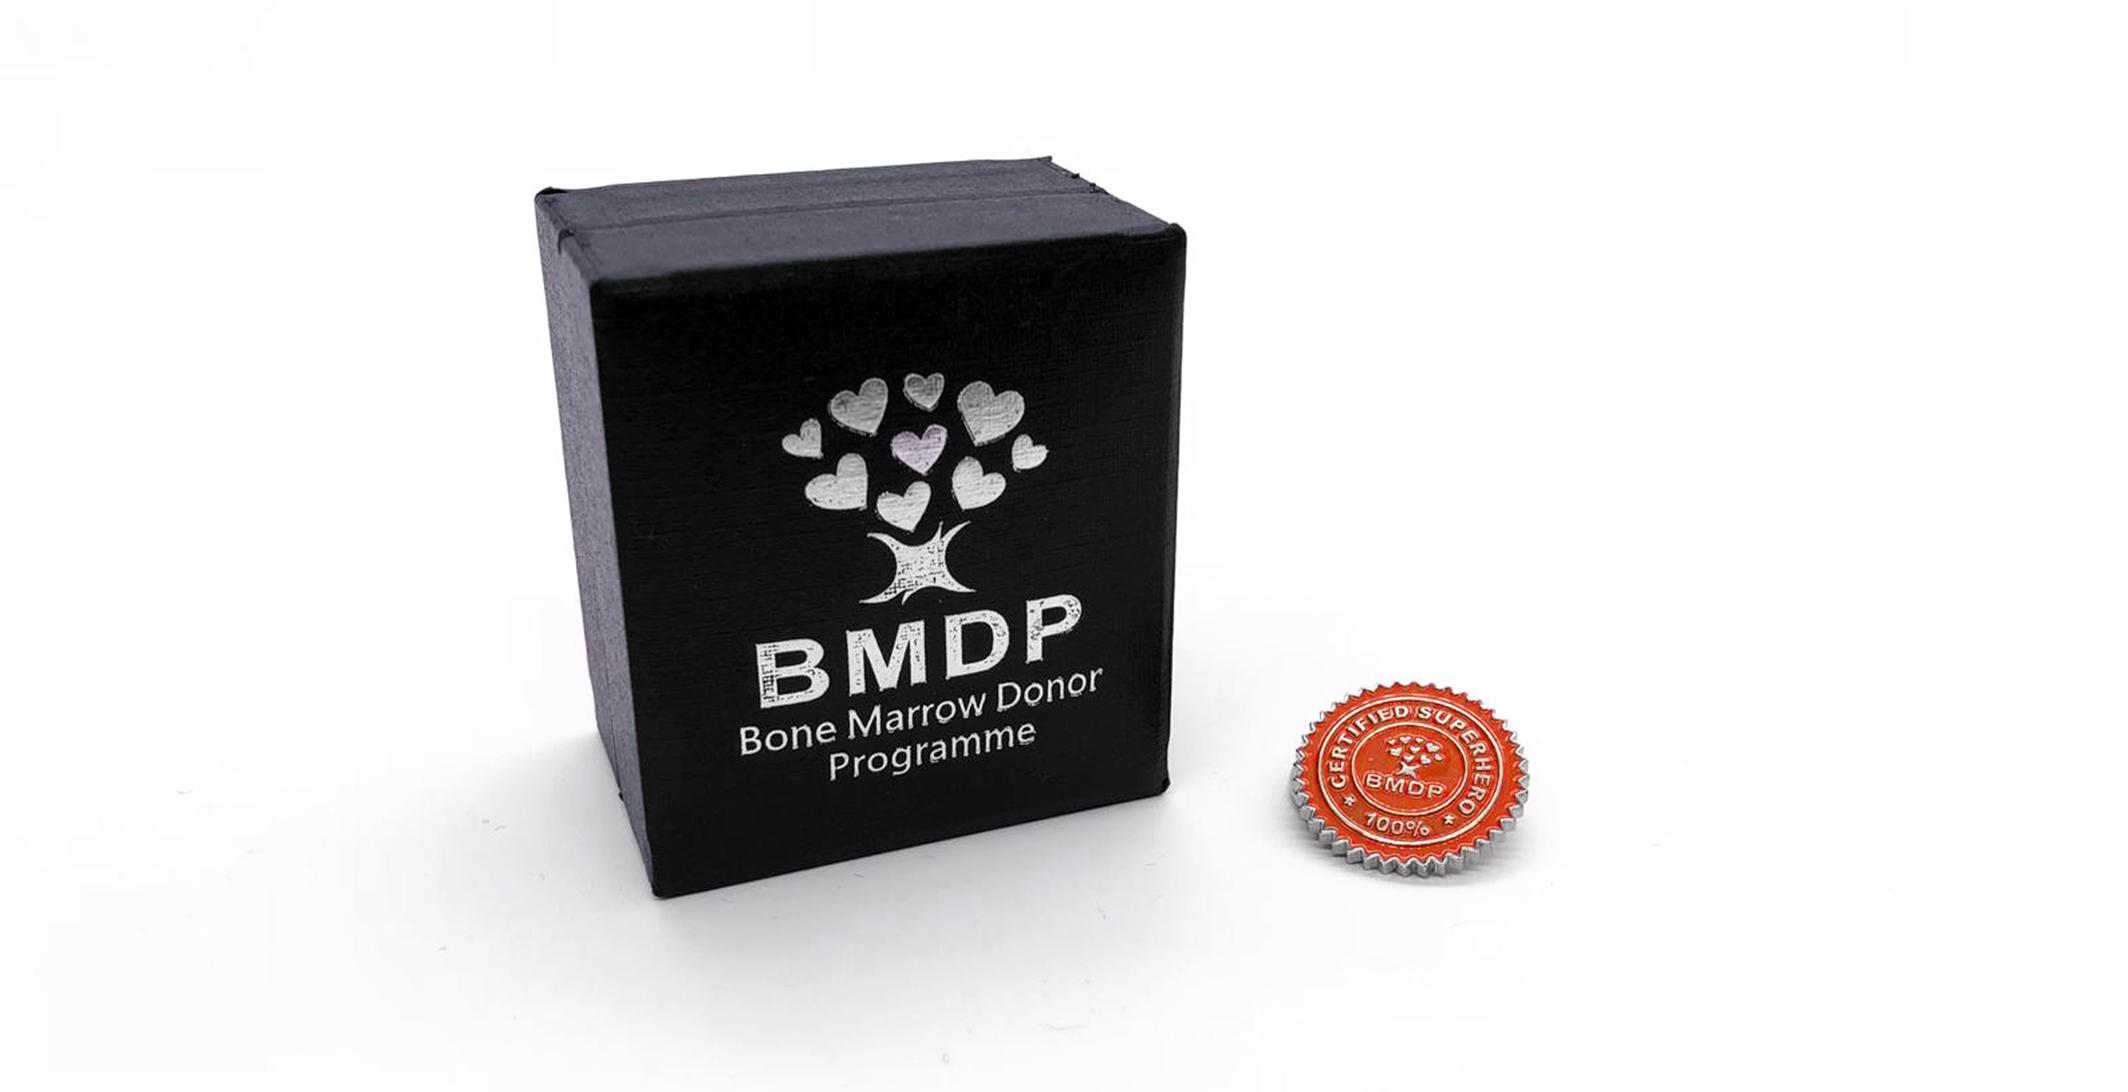 BMDP box